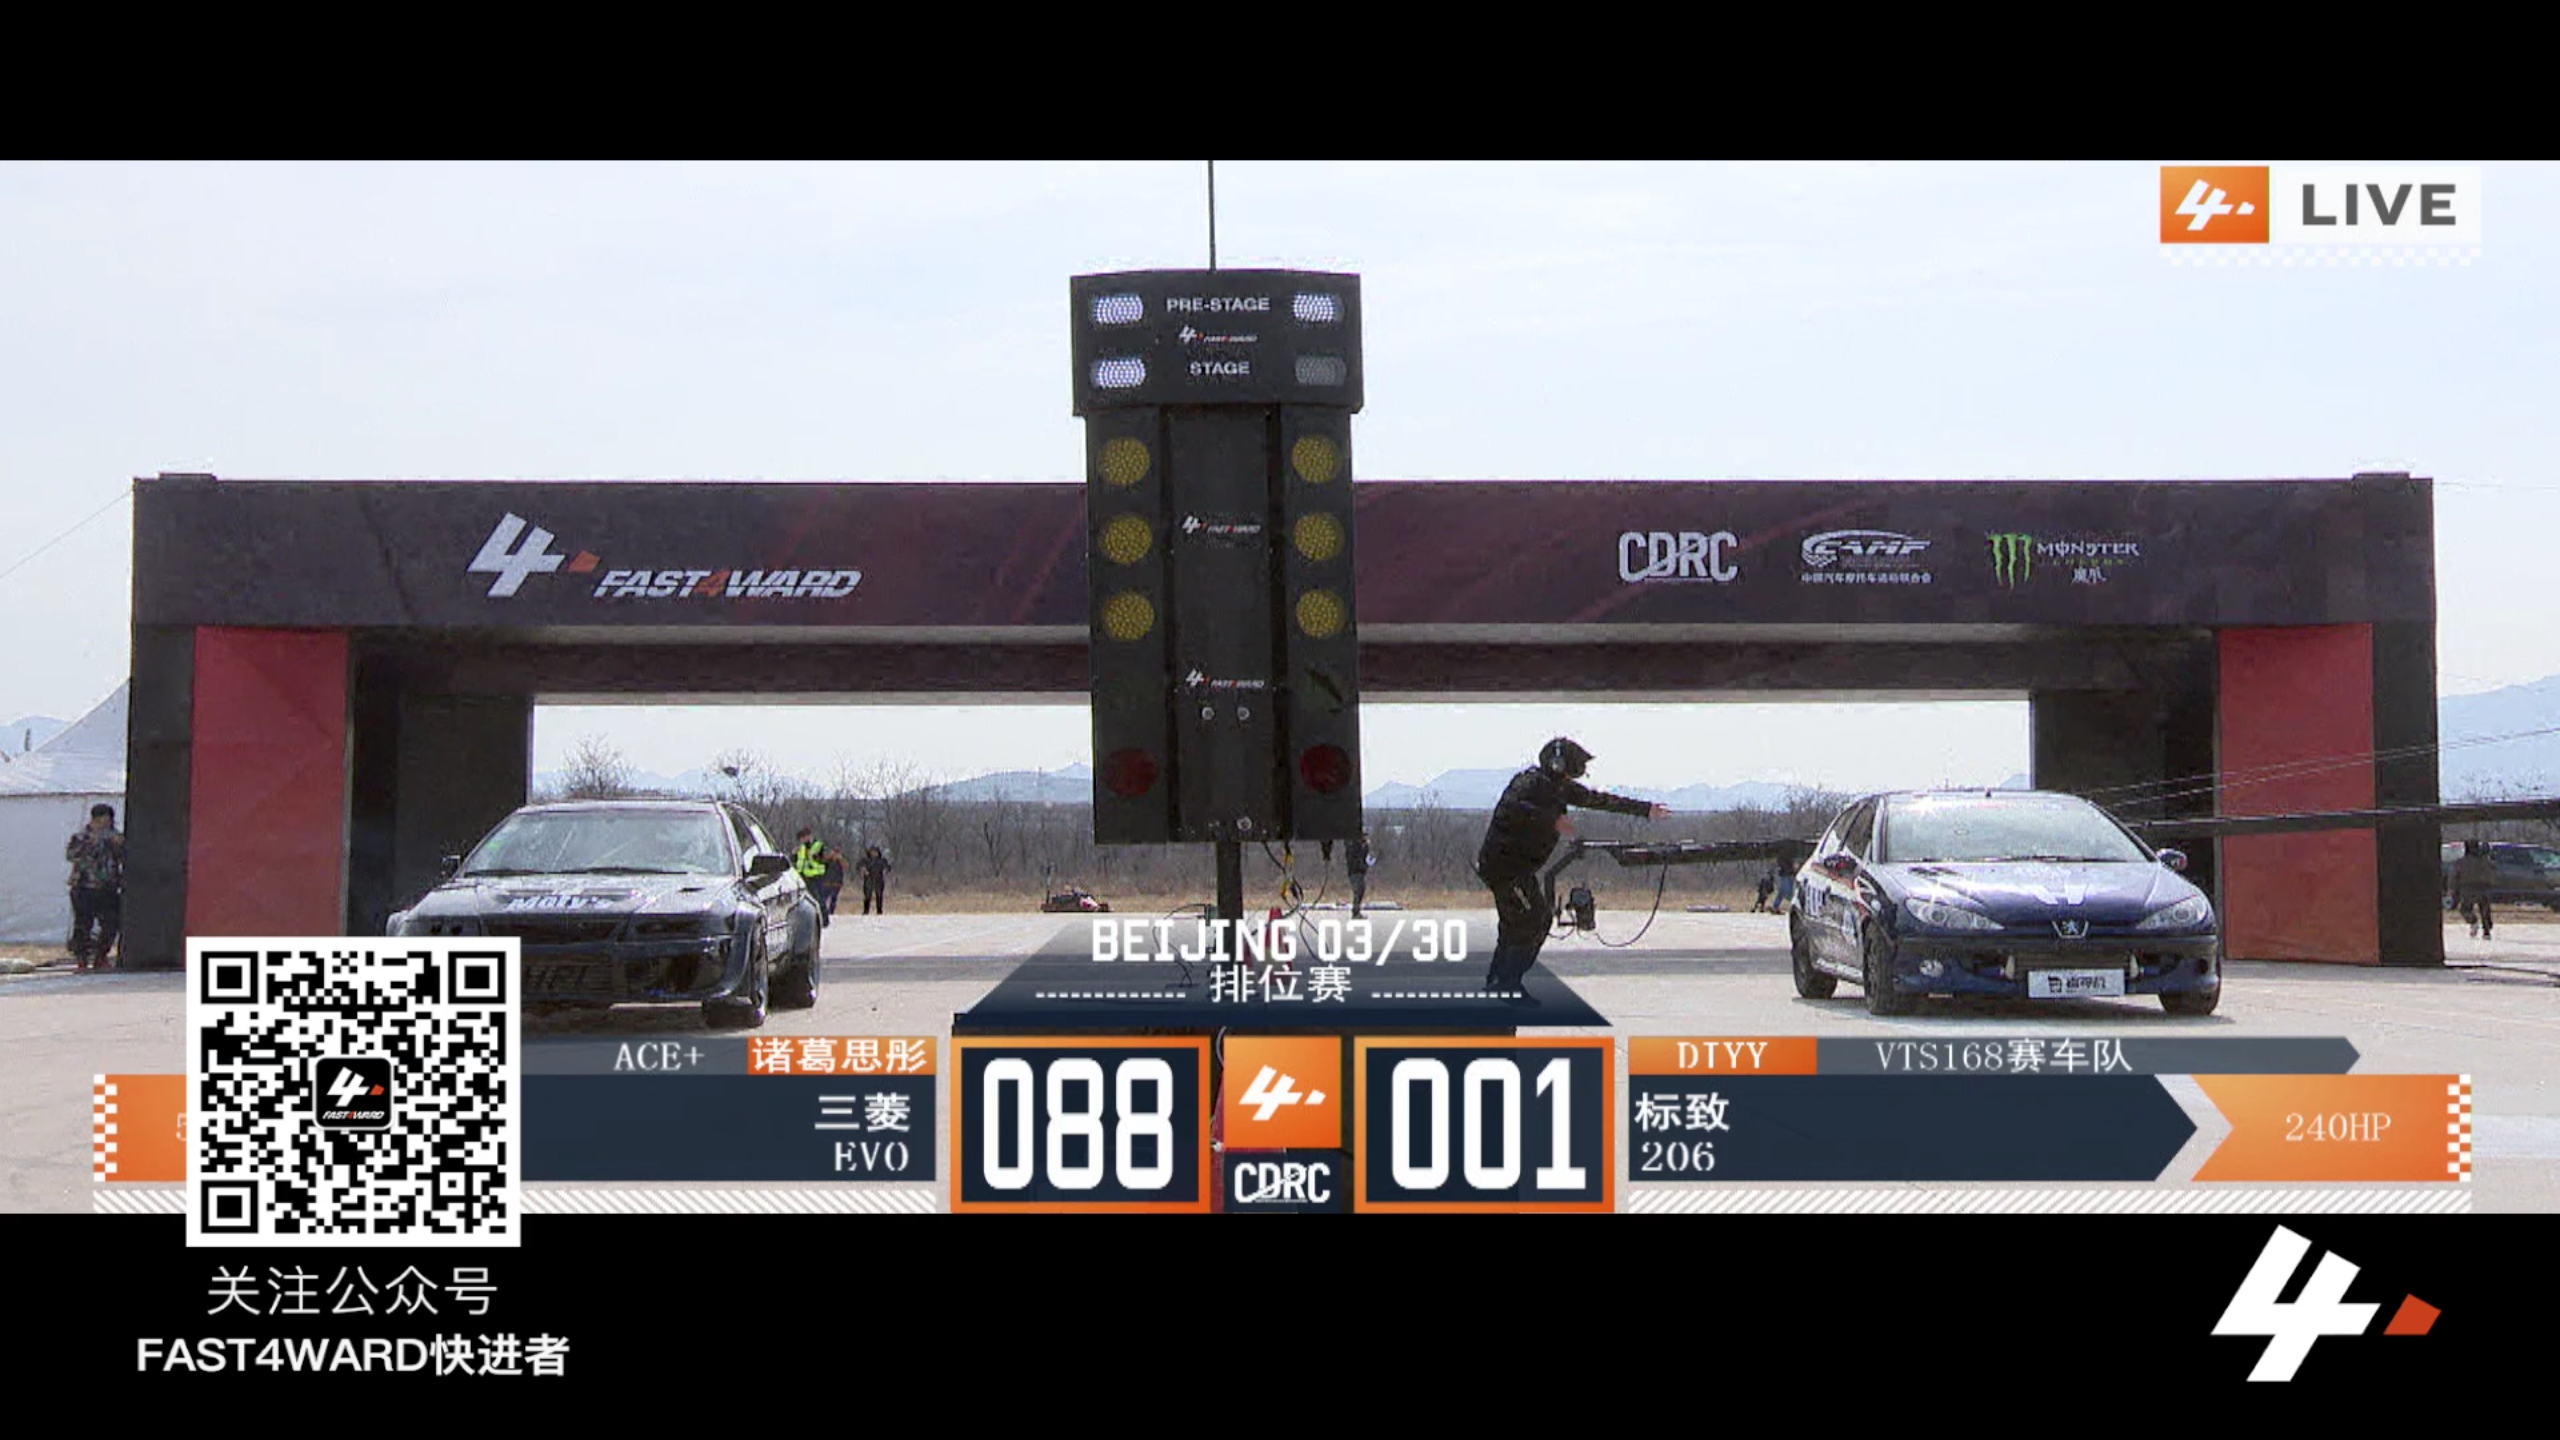 FAST4WARD  北京站 三菱ev0  vs 标志206